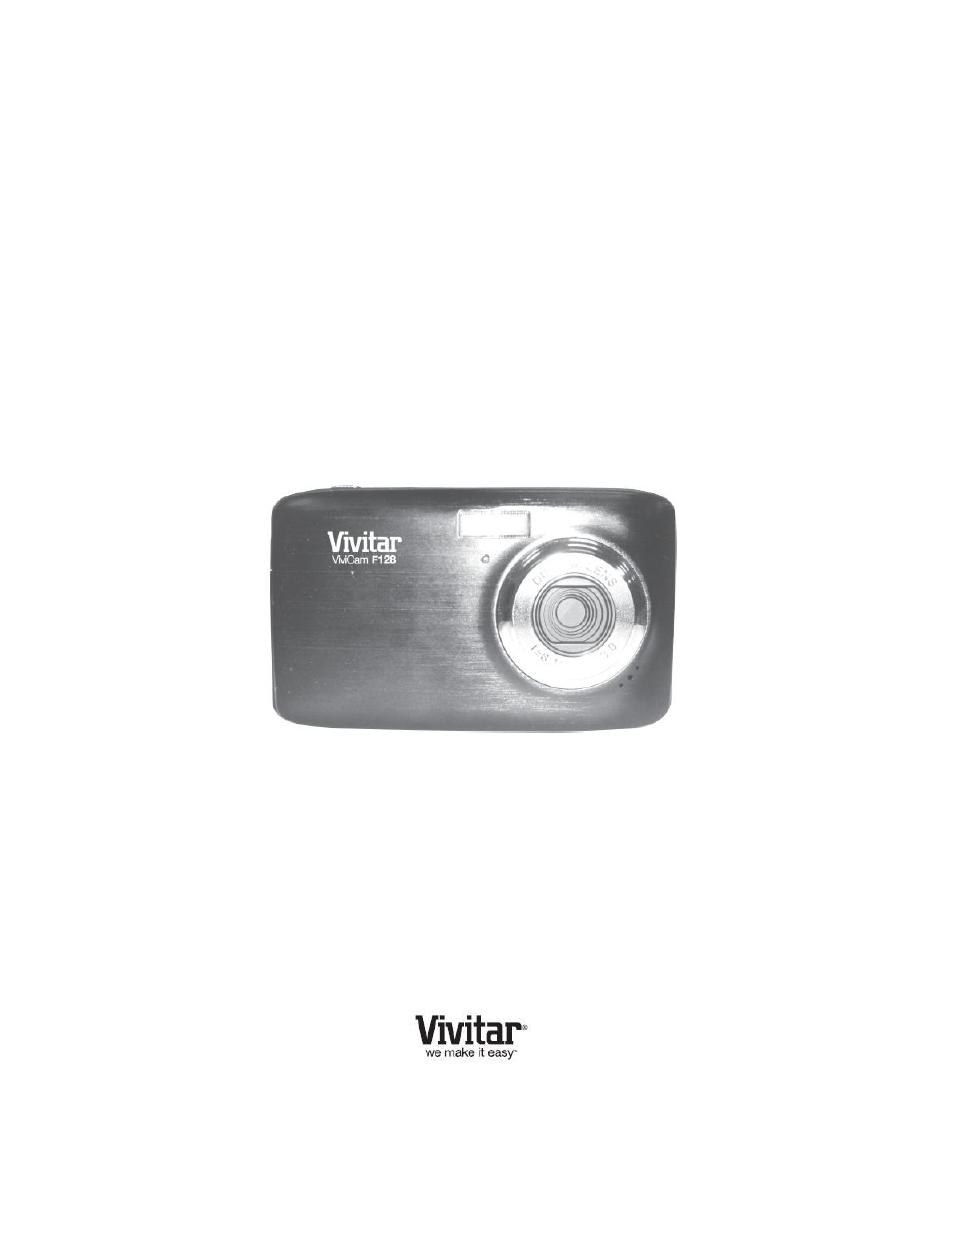 vivitar vivicam f128 user manual 66 pages rh manualsdir com vivitar aquashot underwater digital camera manual vivitar mini digital camera manual